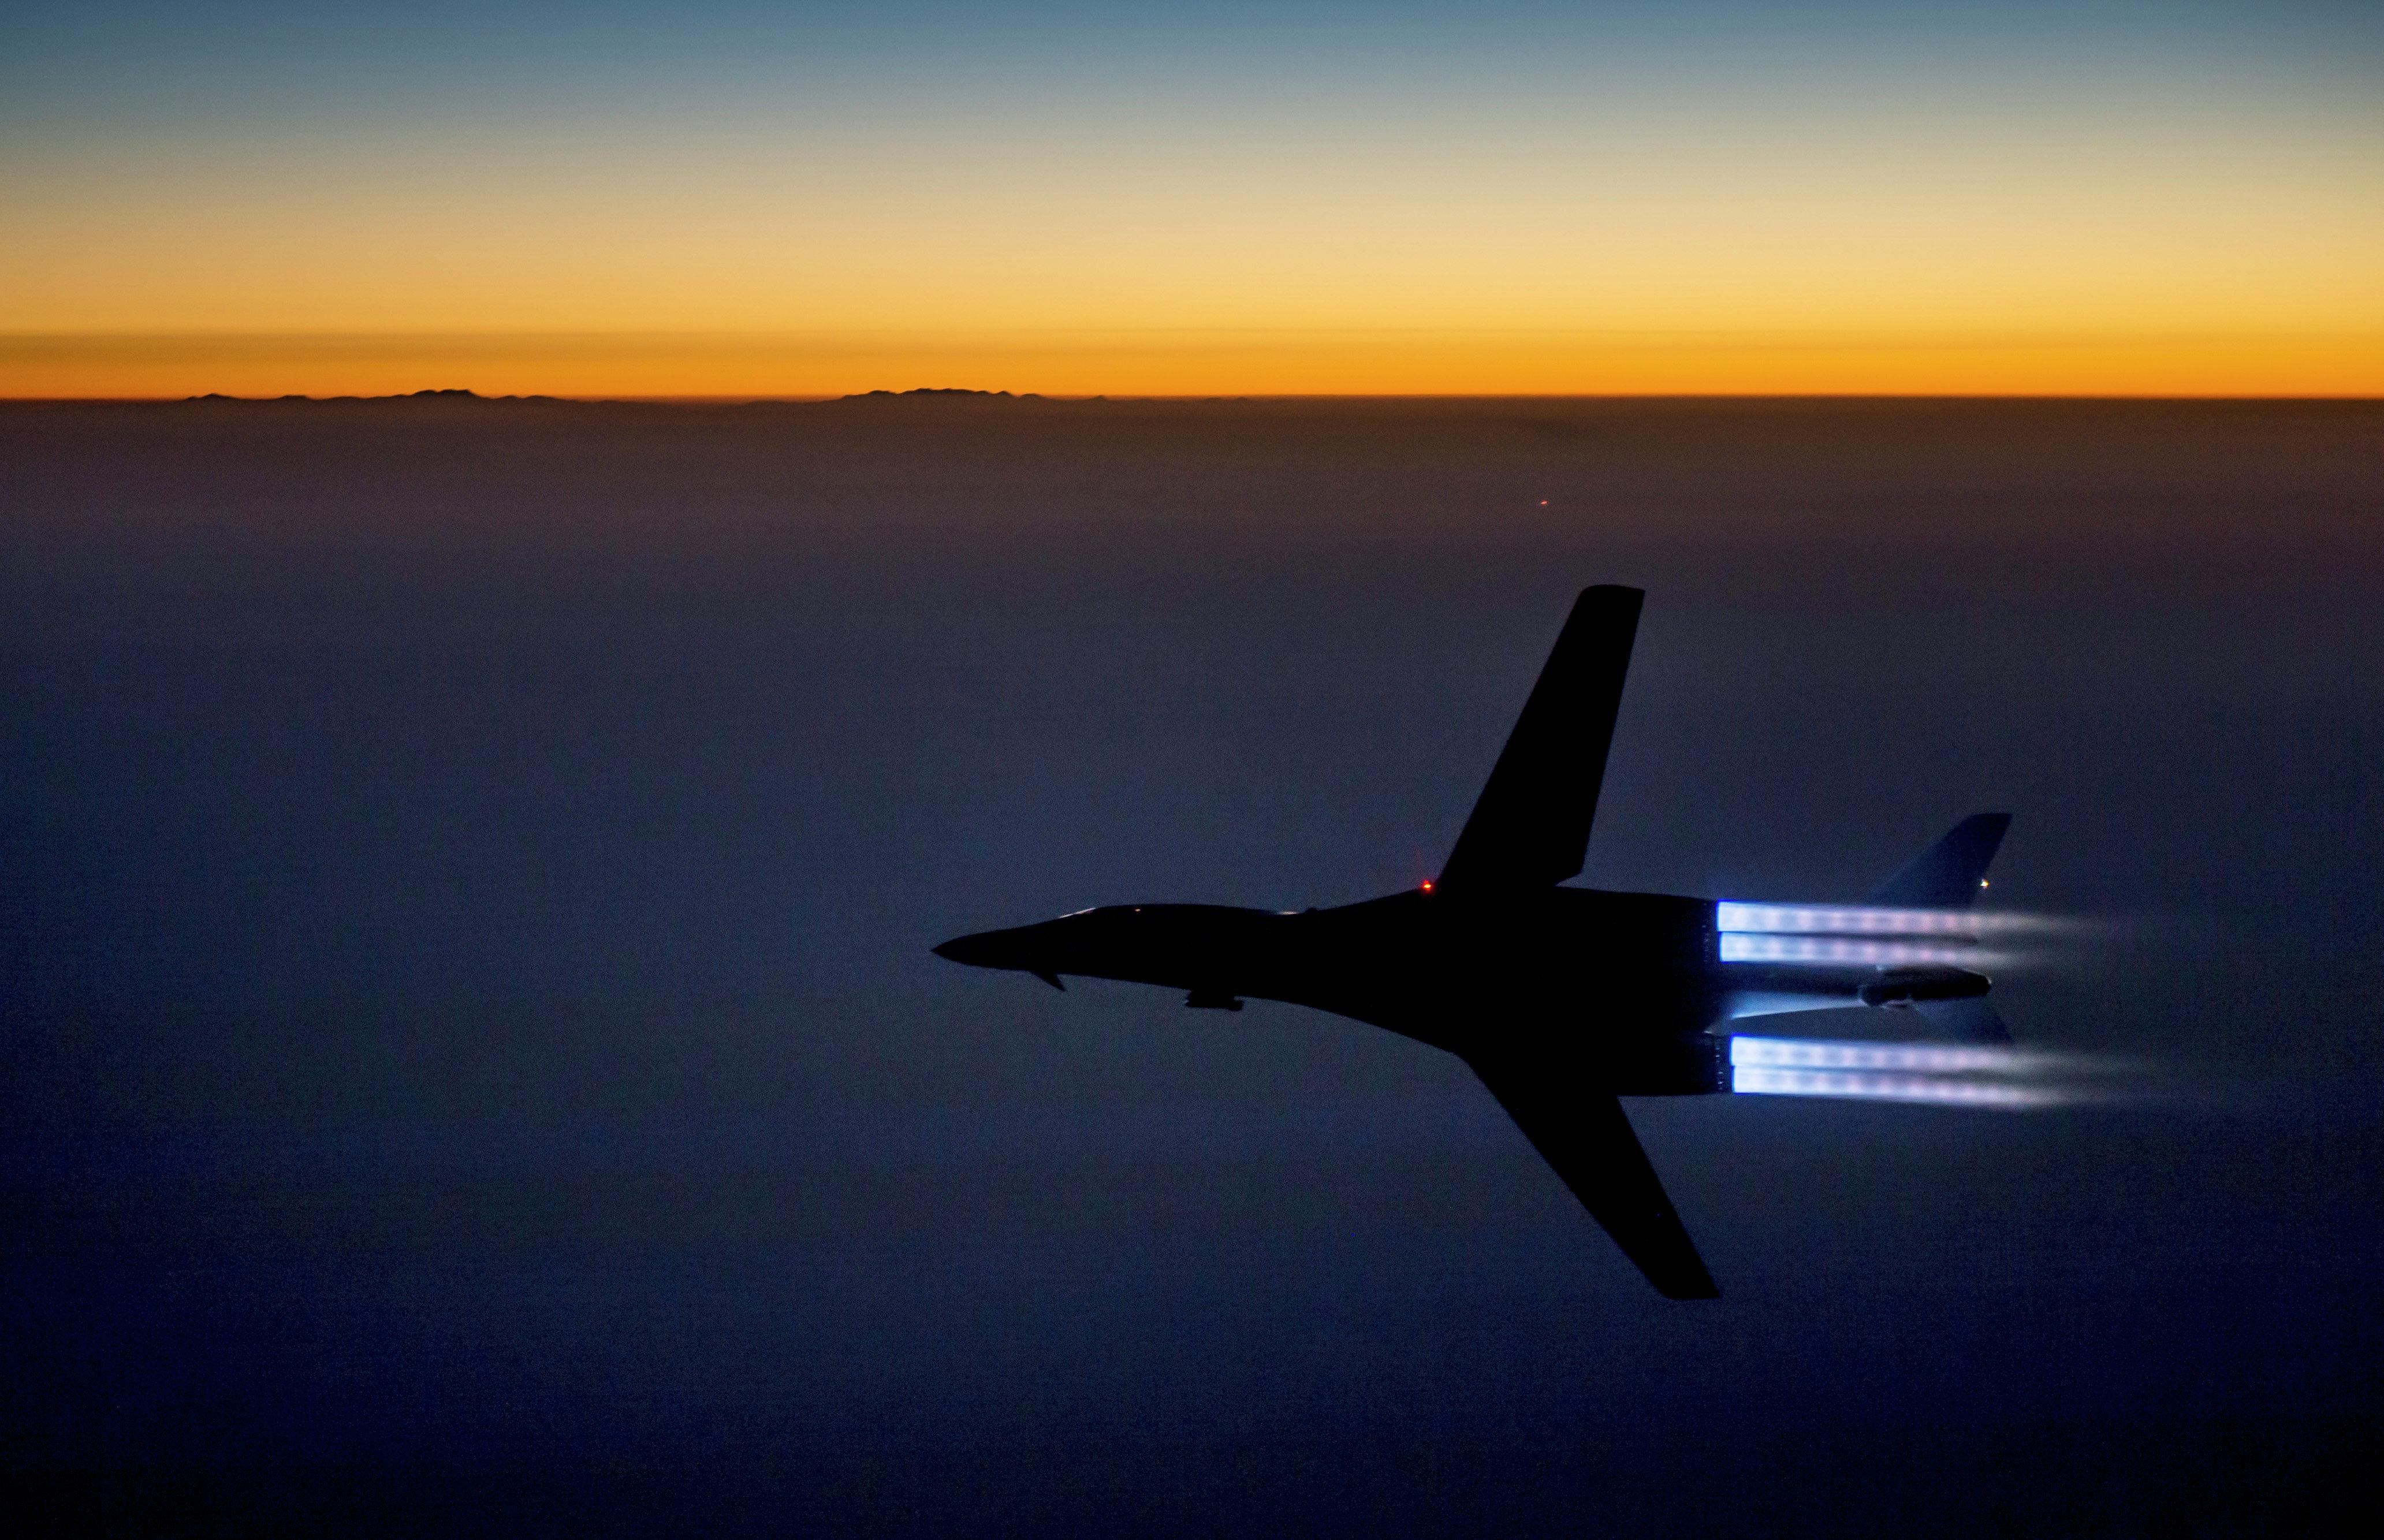 US Coalition Air Strike 'Accidentally' Kills 20 Pro-Govt Iraqi Fighters near Mosul